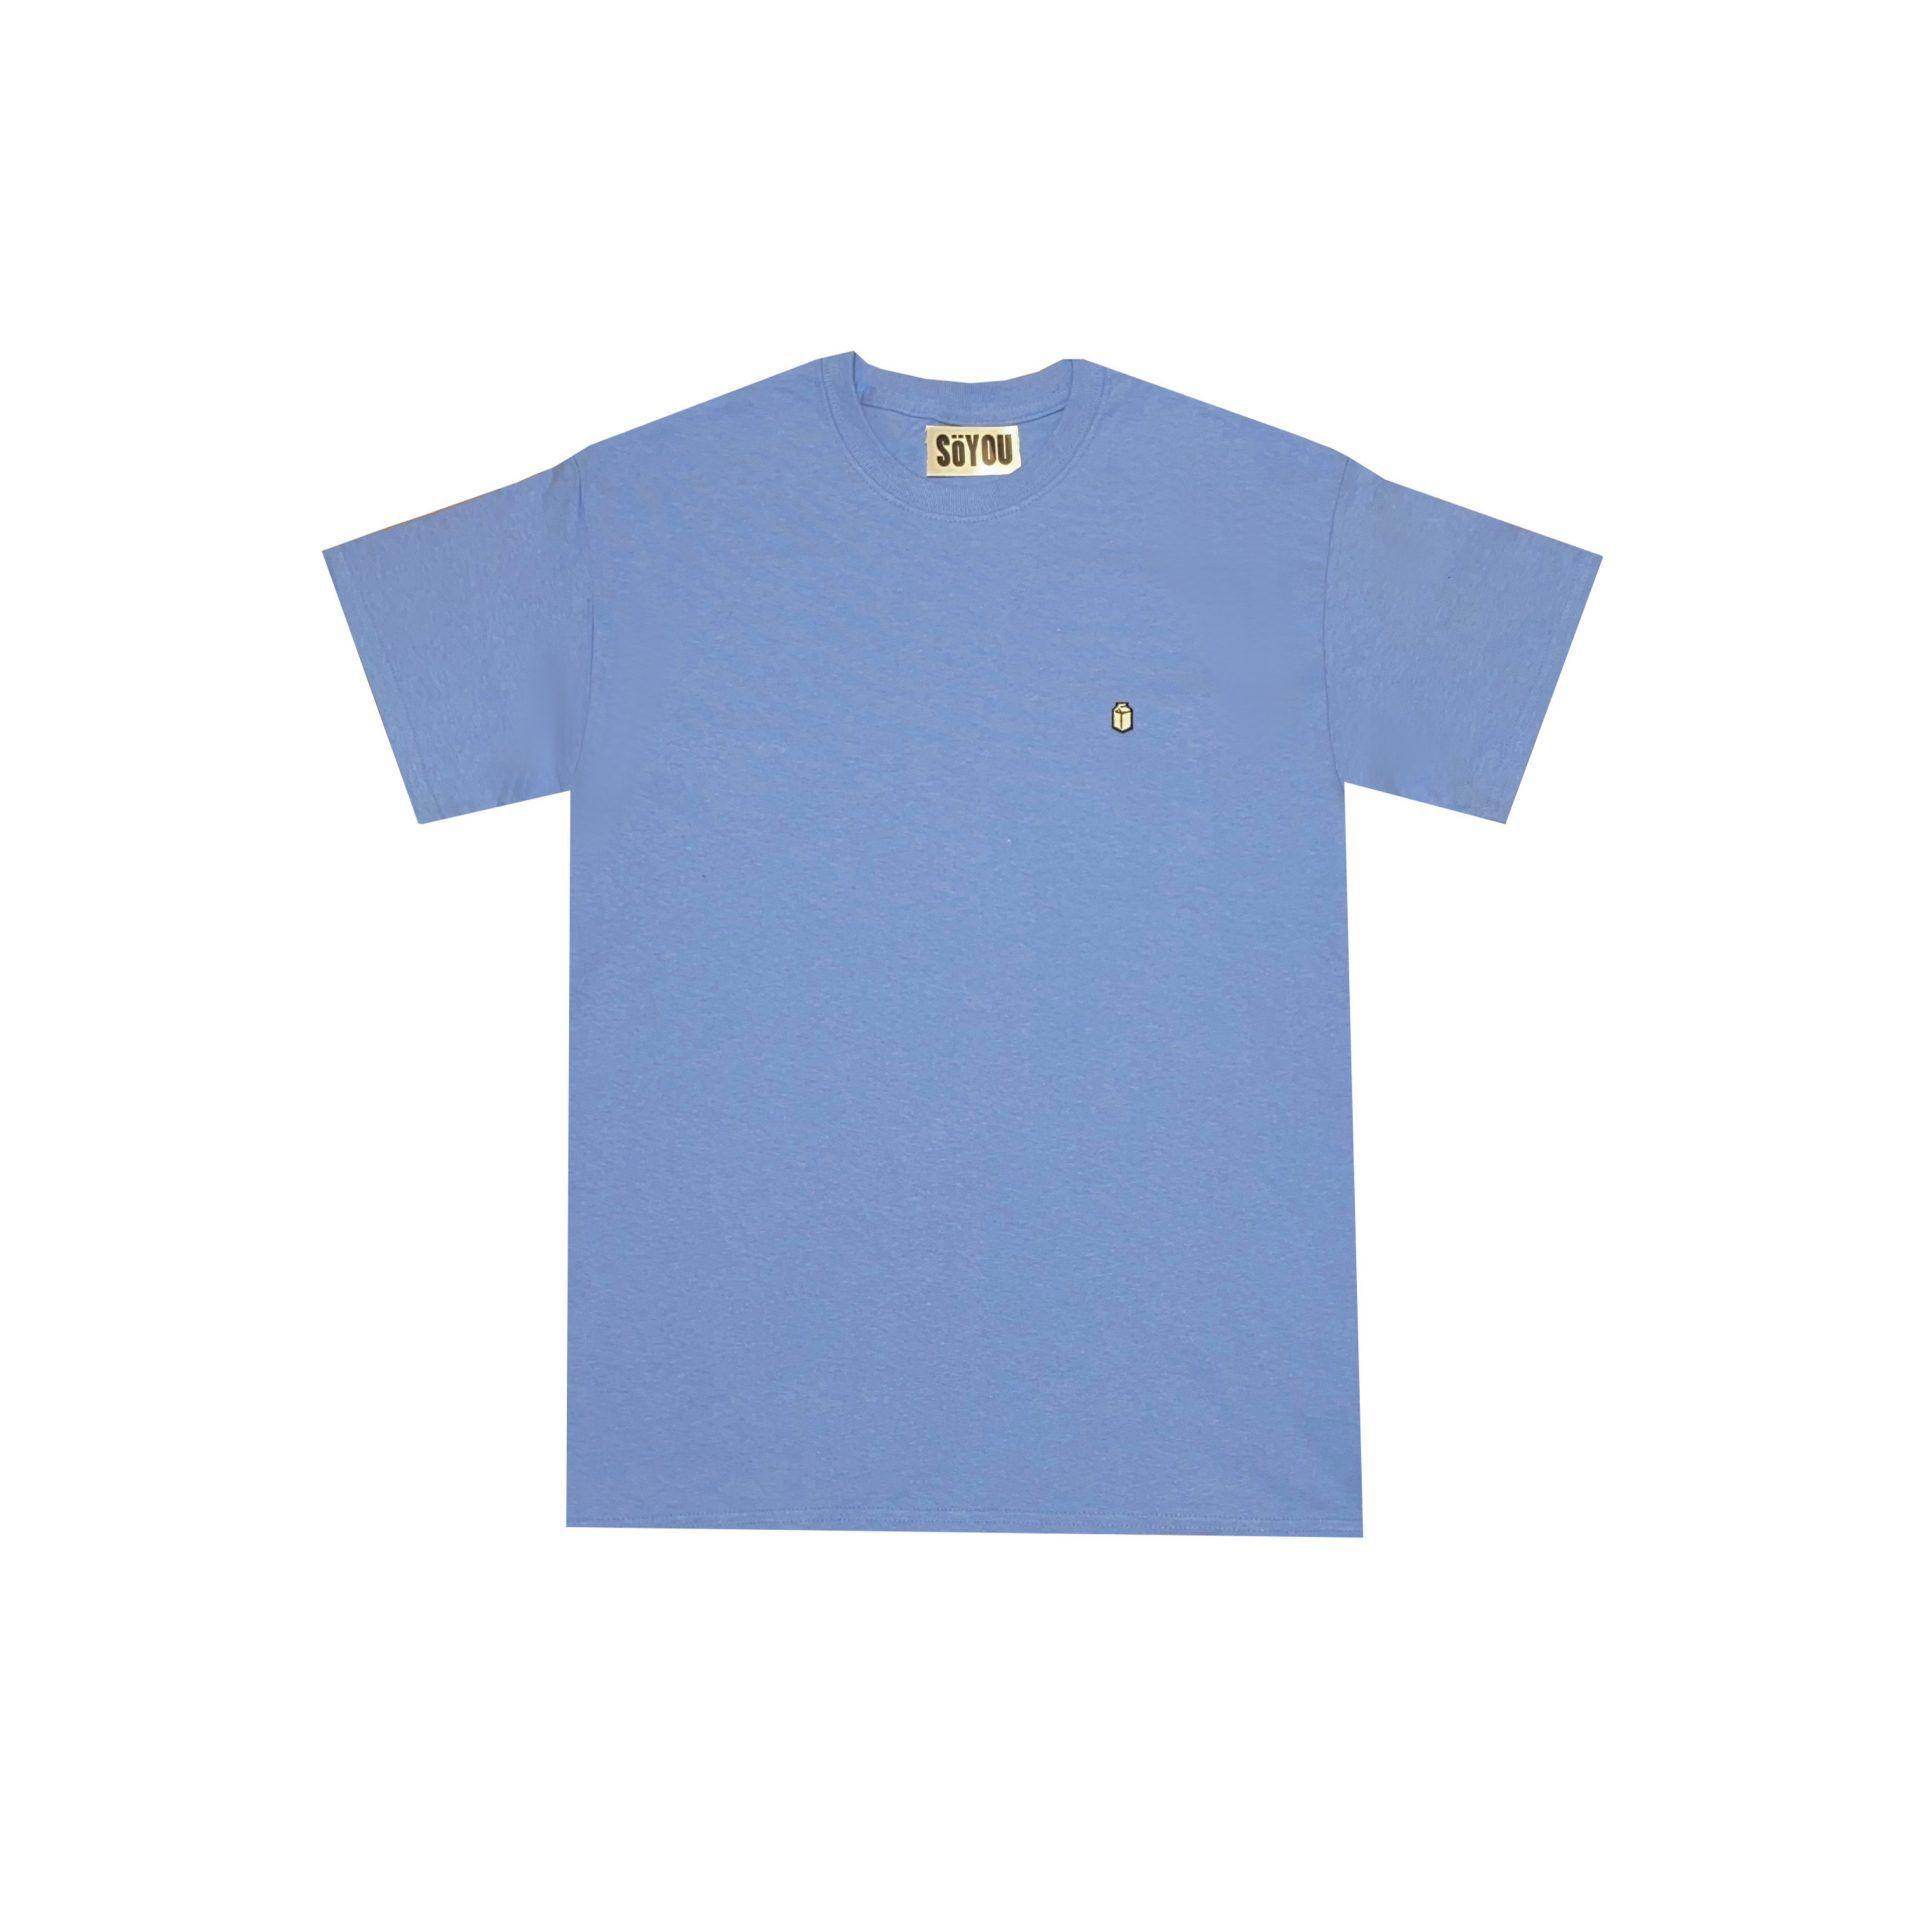 SoYou Clothing Basics T-Shirt in Periwinkle